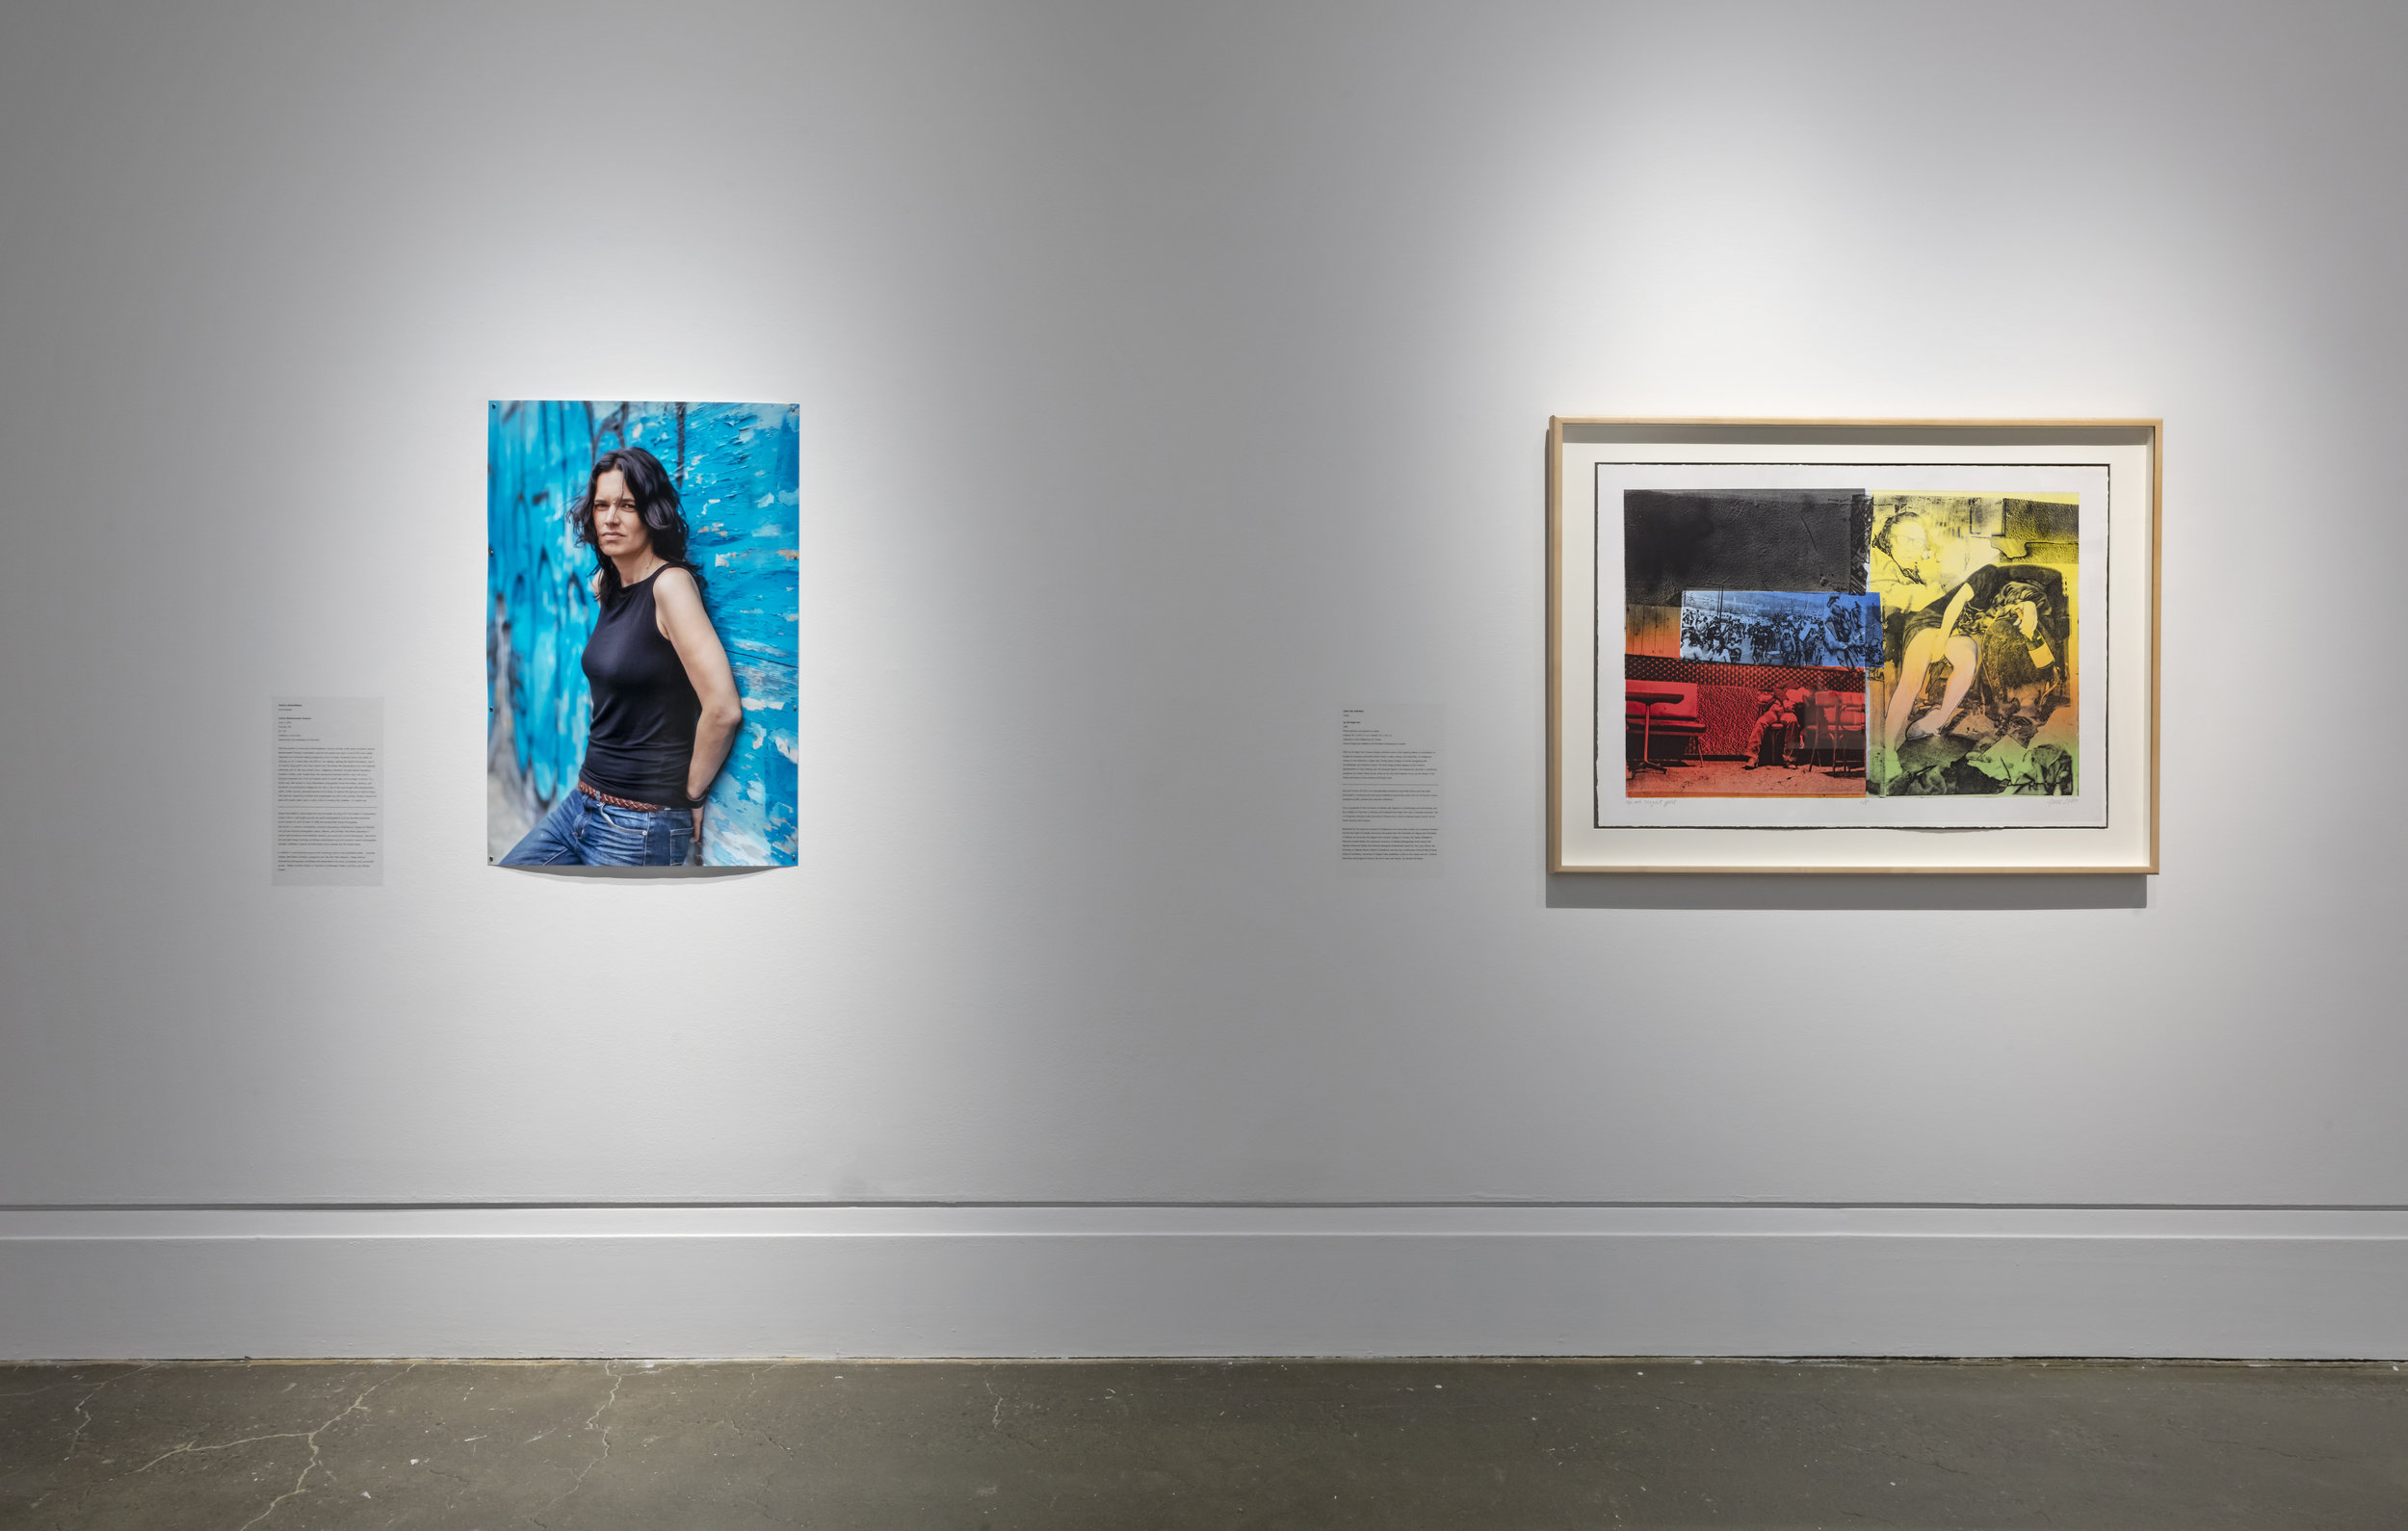 niigaanikwewag, Robert Freeman Gallery, Art Gallery of Mississauga, Photo by Toni Hafkenschneid